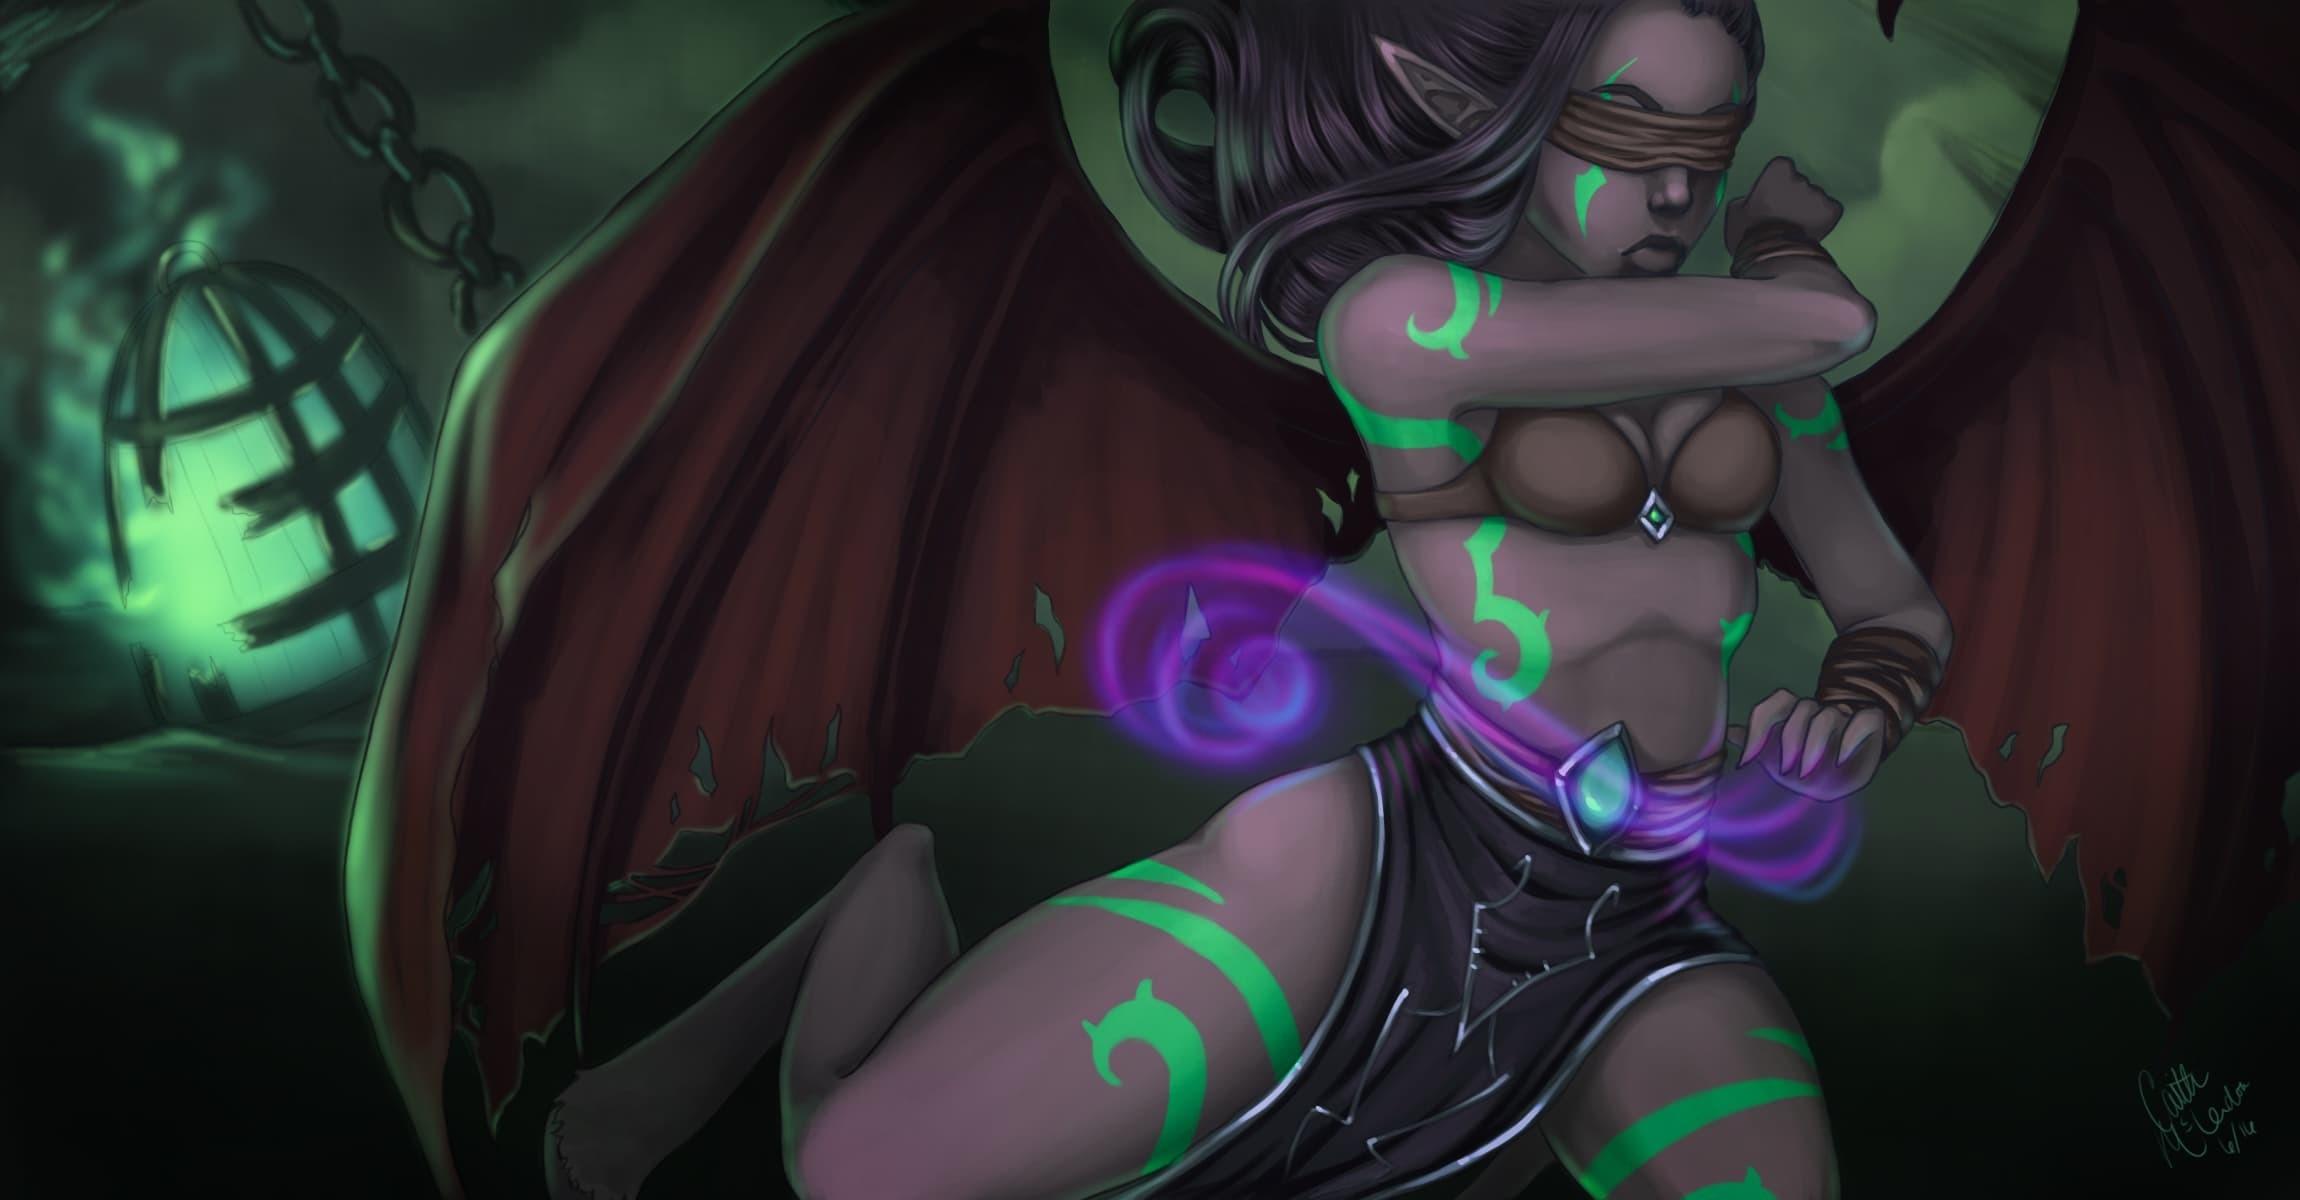 Demon Wallpaper World of Warcraft Legion Wallpapers Wallpapers)